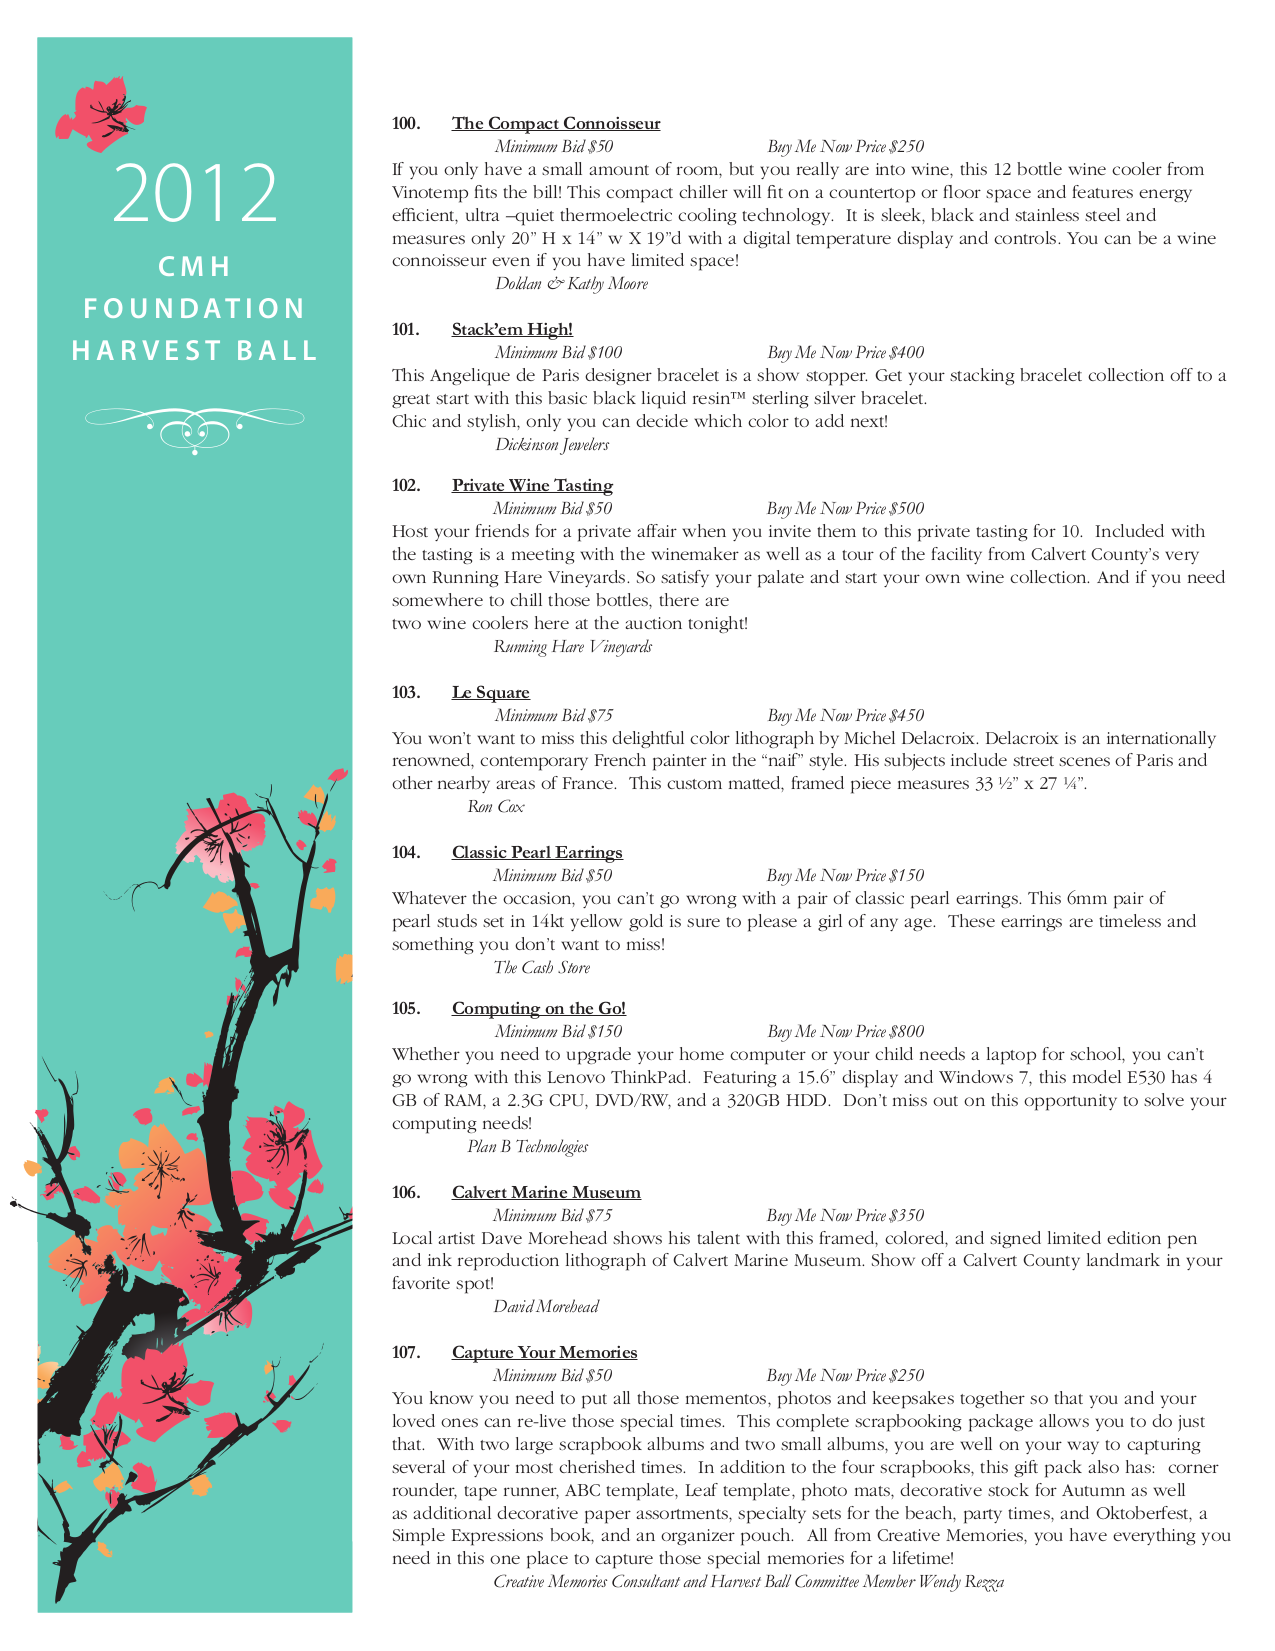 pdf for Vinotemp Refrigerator 230 manual